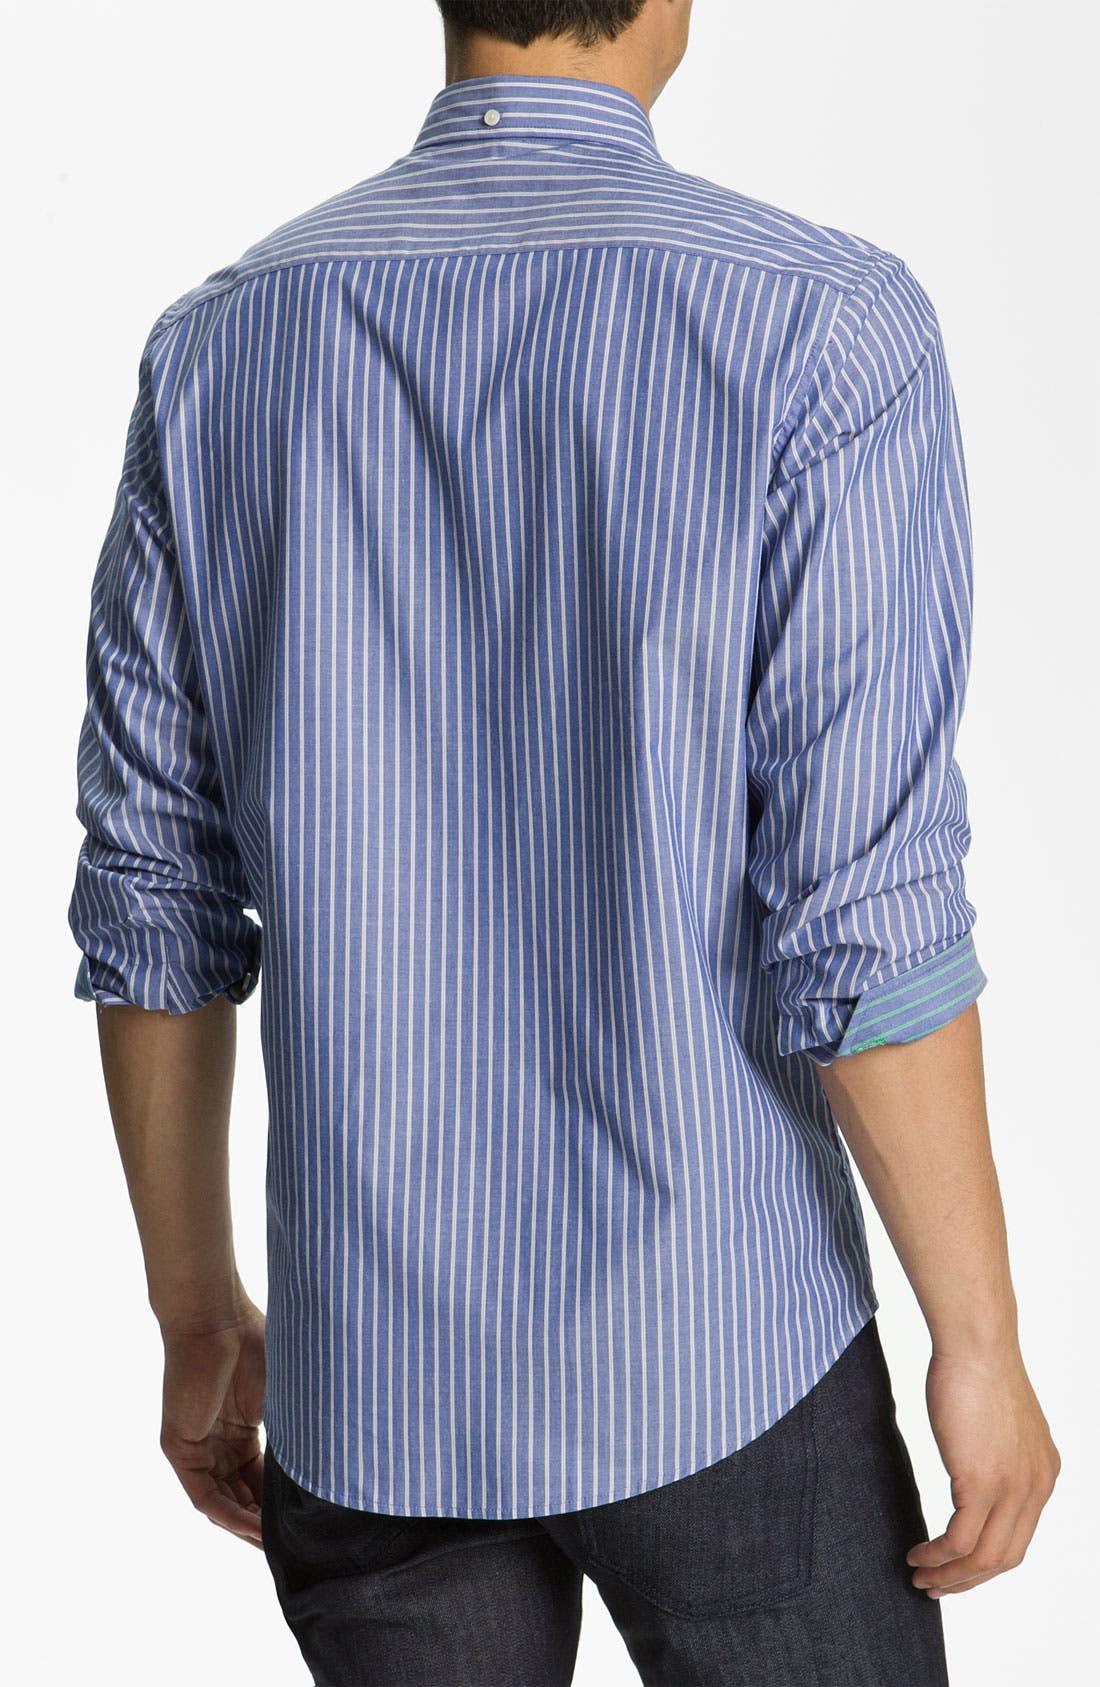 Alternate Image 2  - Ben Sherman 'Clerkenwell' Stripe Woven Shirt